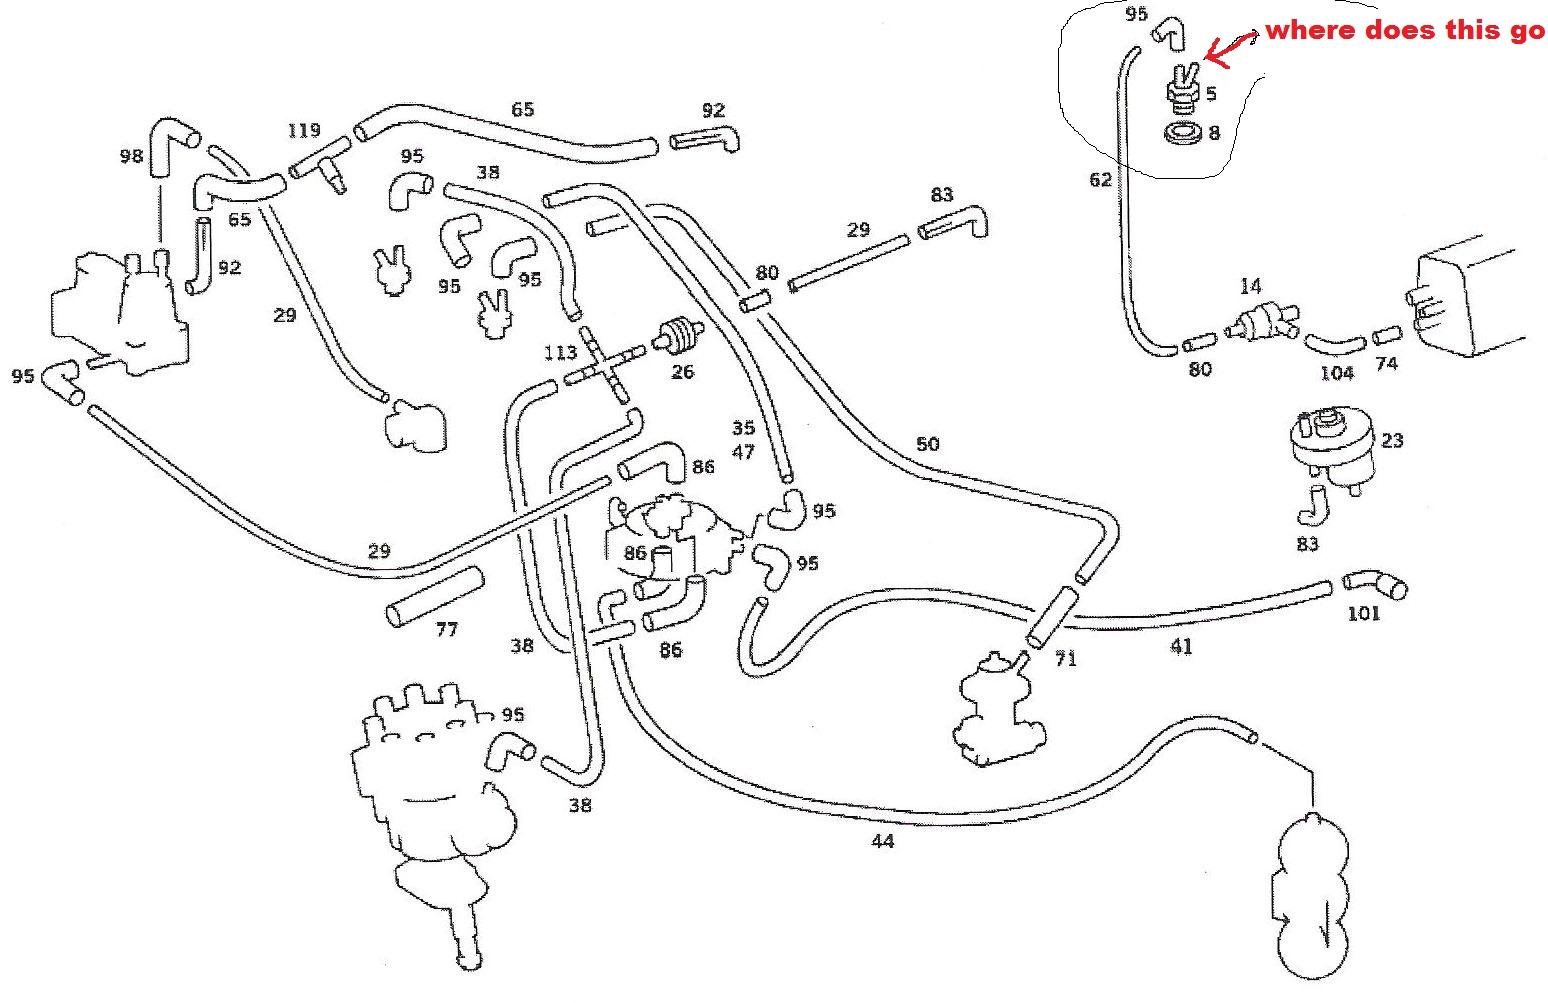 [DIAGRAM_5UK]  TF_2474] Corvette Vacuum Line Diagram Further Mercedes Benz Vacuum Line Diagram  Schematic Wiring | Mercedes 500sec Engine Diagram |  | Ical Sapebe Umng Mohammedshrine Librar Wiring 101